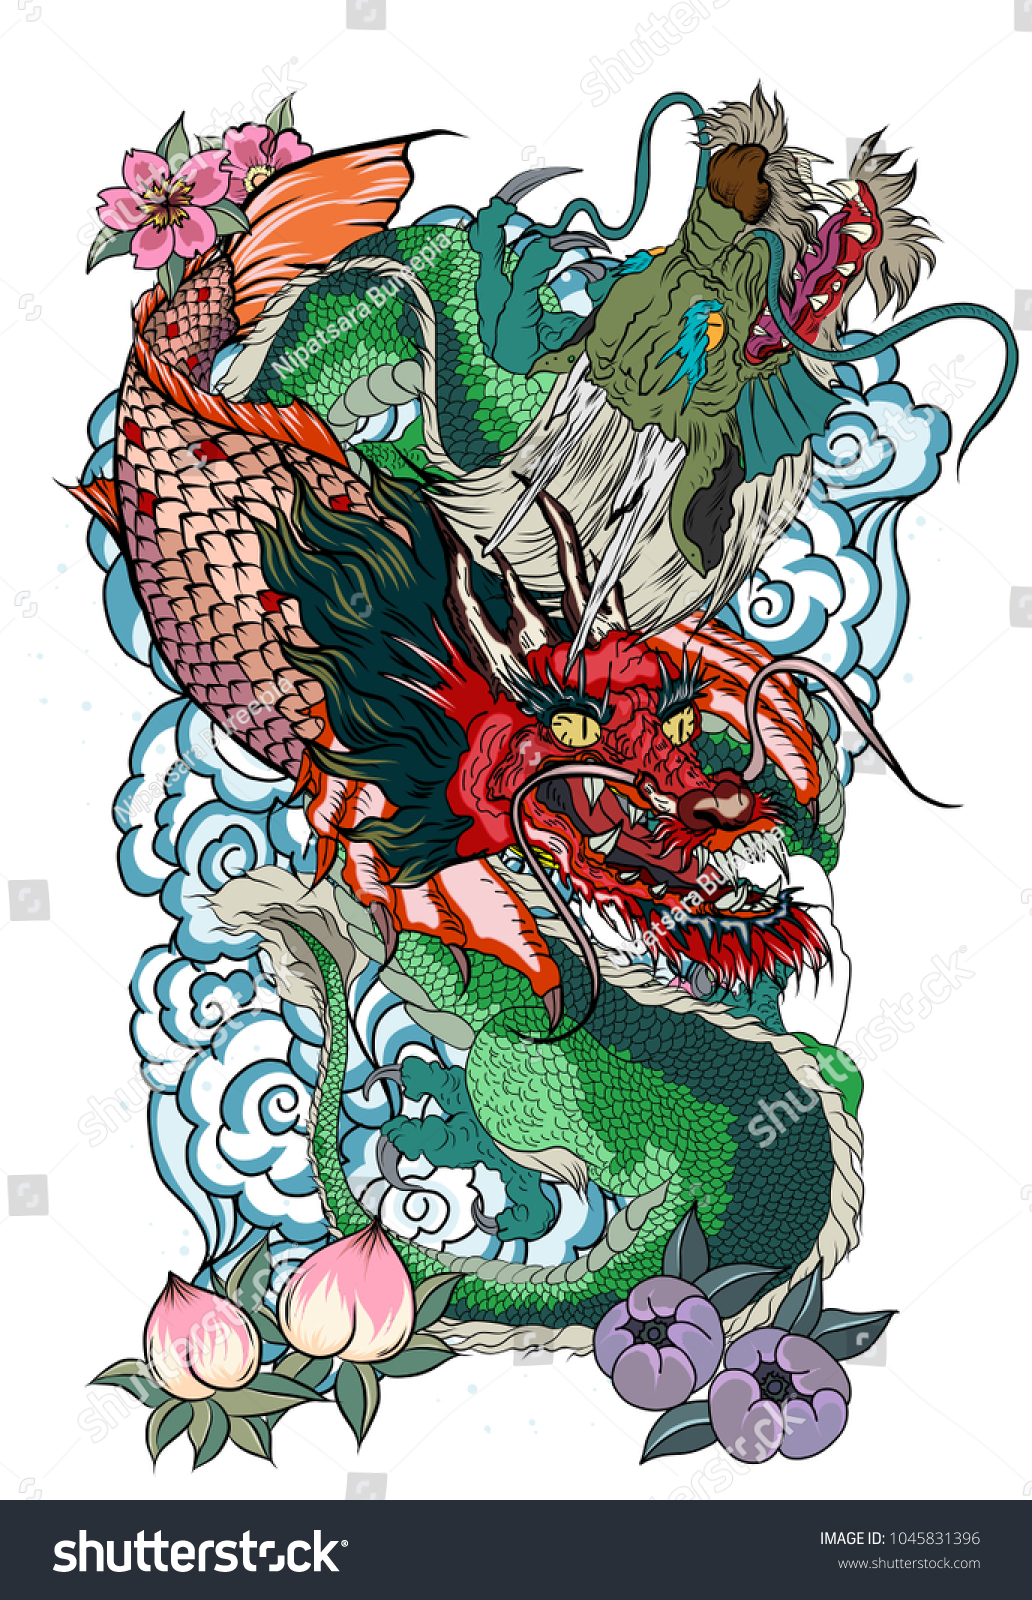 Dragon koi dragon lotus flower tattoopeach stock vector 1045831396 dragon with koi dragon and lotus flower tattooach with sakura and plum flower on izmirmasajfo